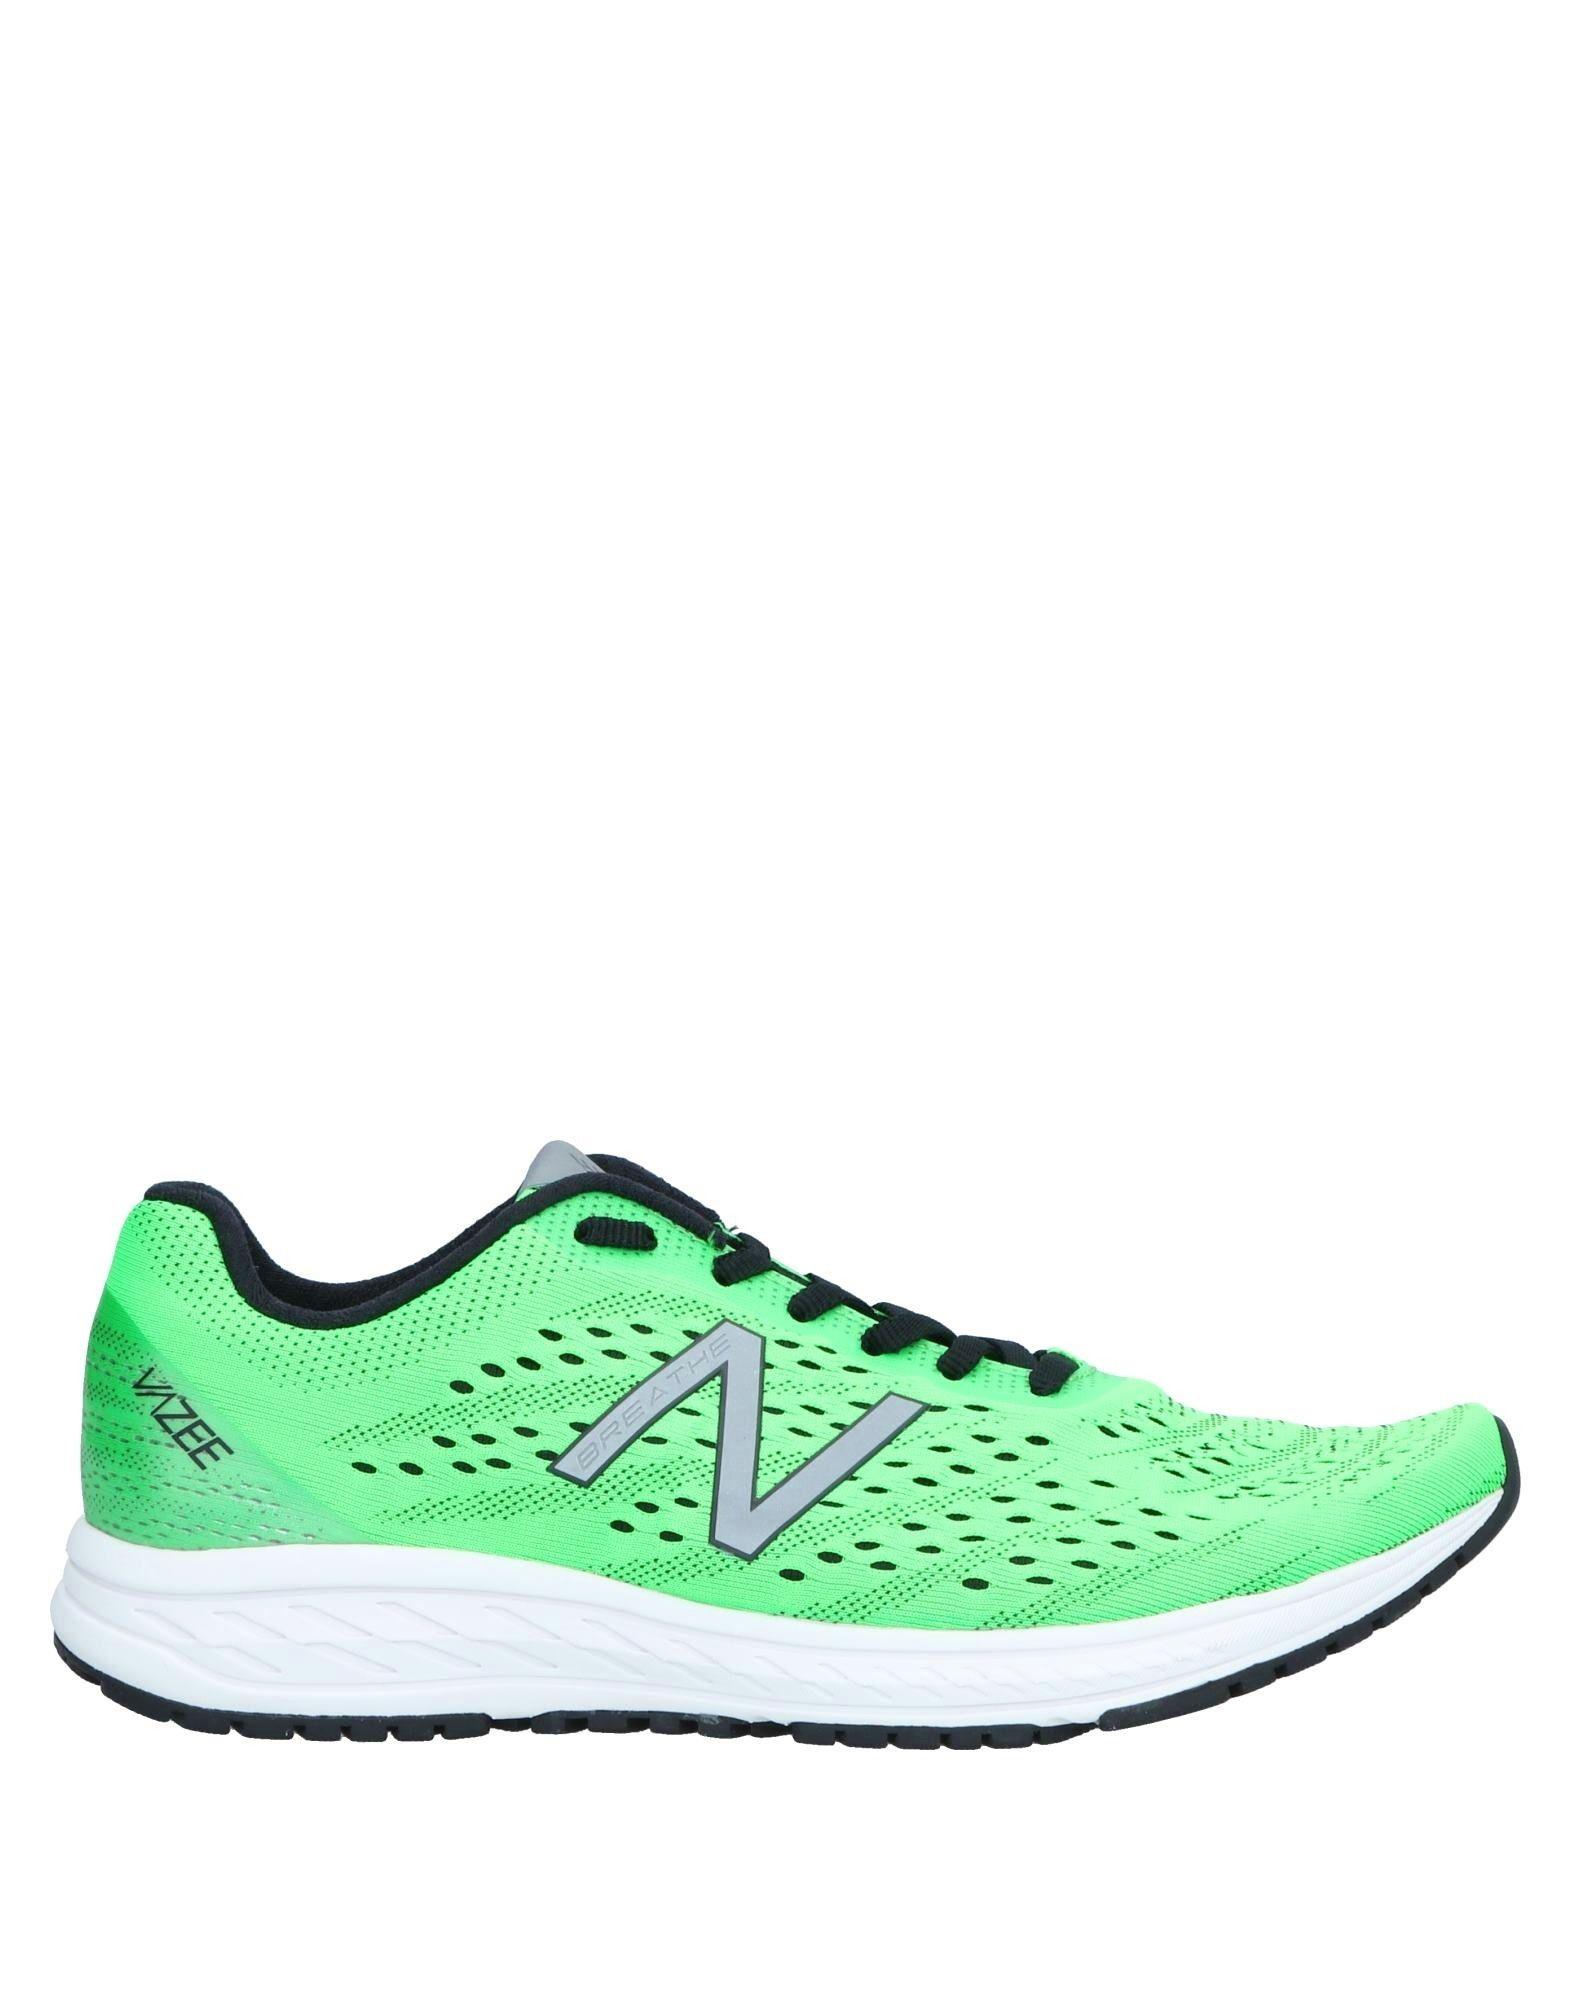 Rabatt echte Schuhe New Balance Sneakers Herren  11544738JI